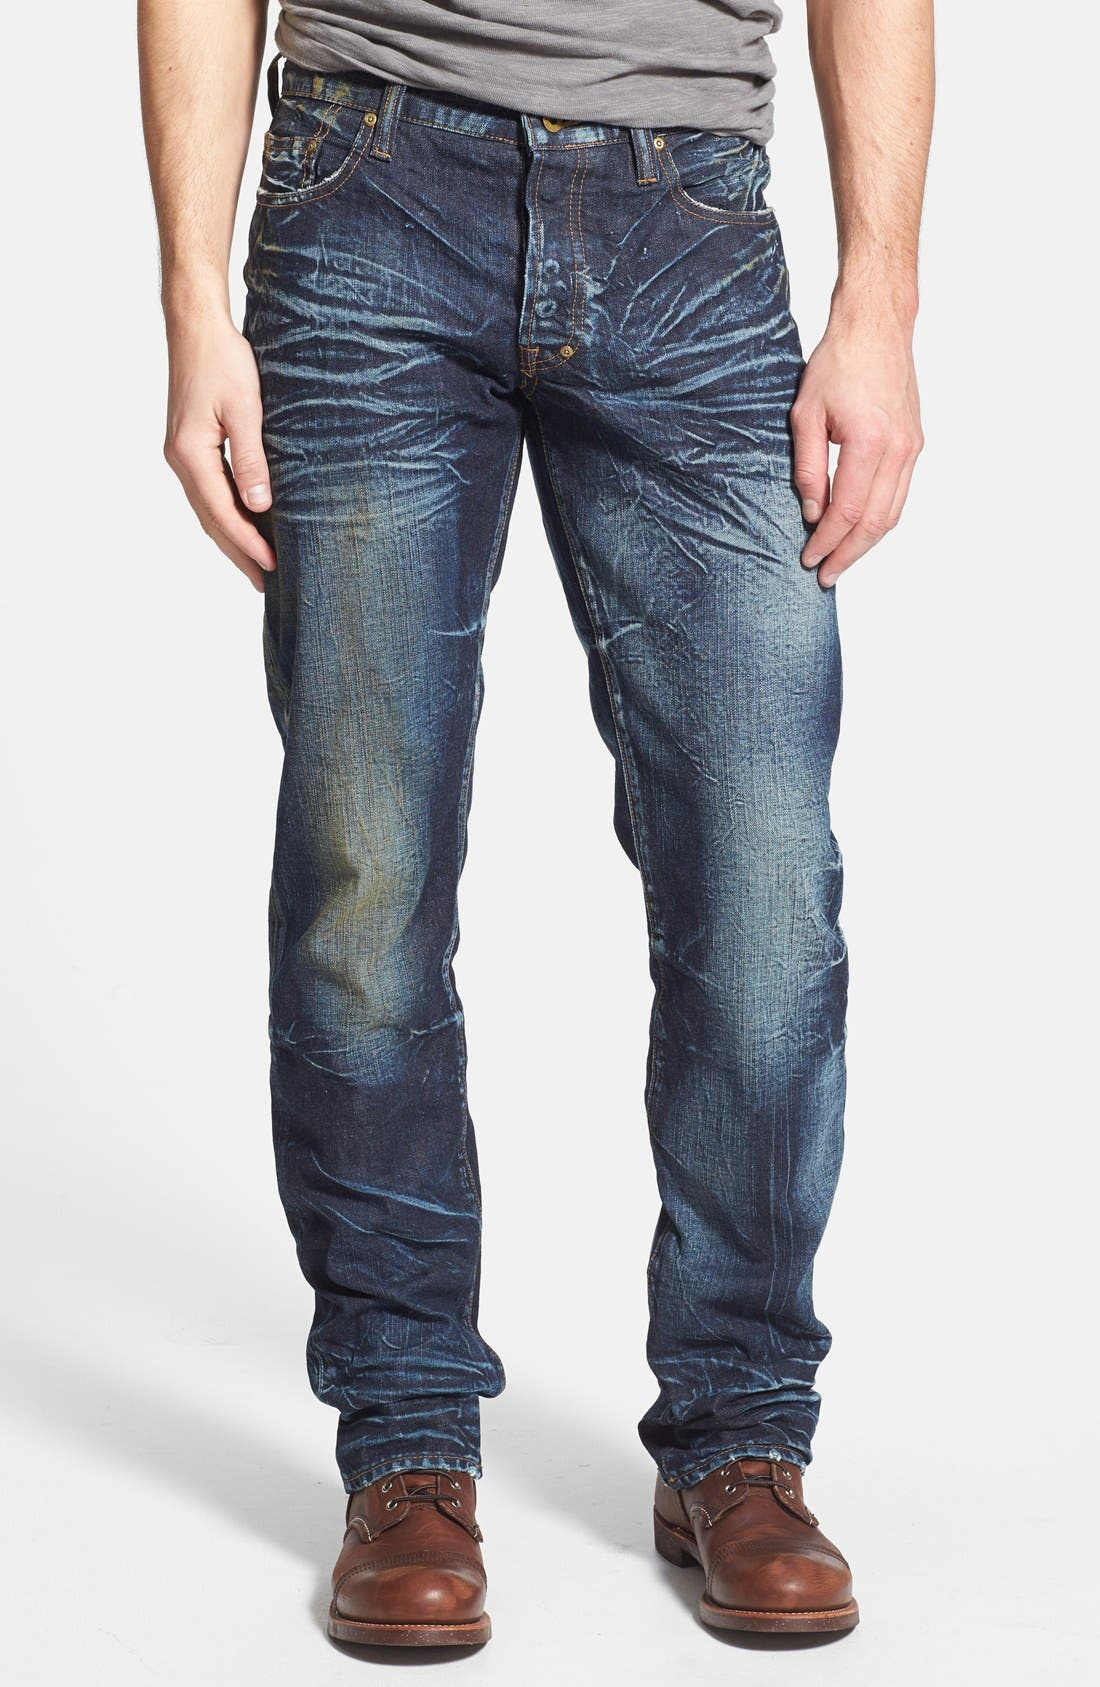 Main Image - PRPS 'Barracuda' Distressed Straight Leg Jeans (Winged Bat)